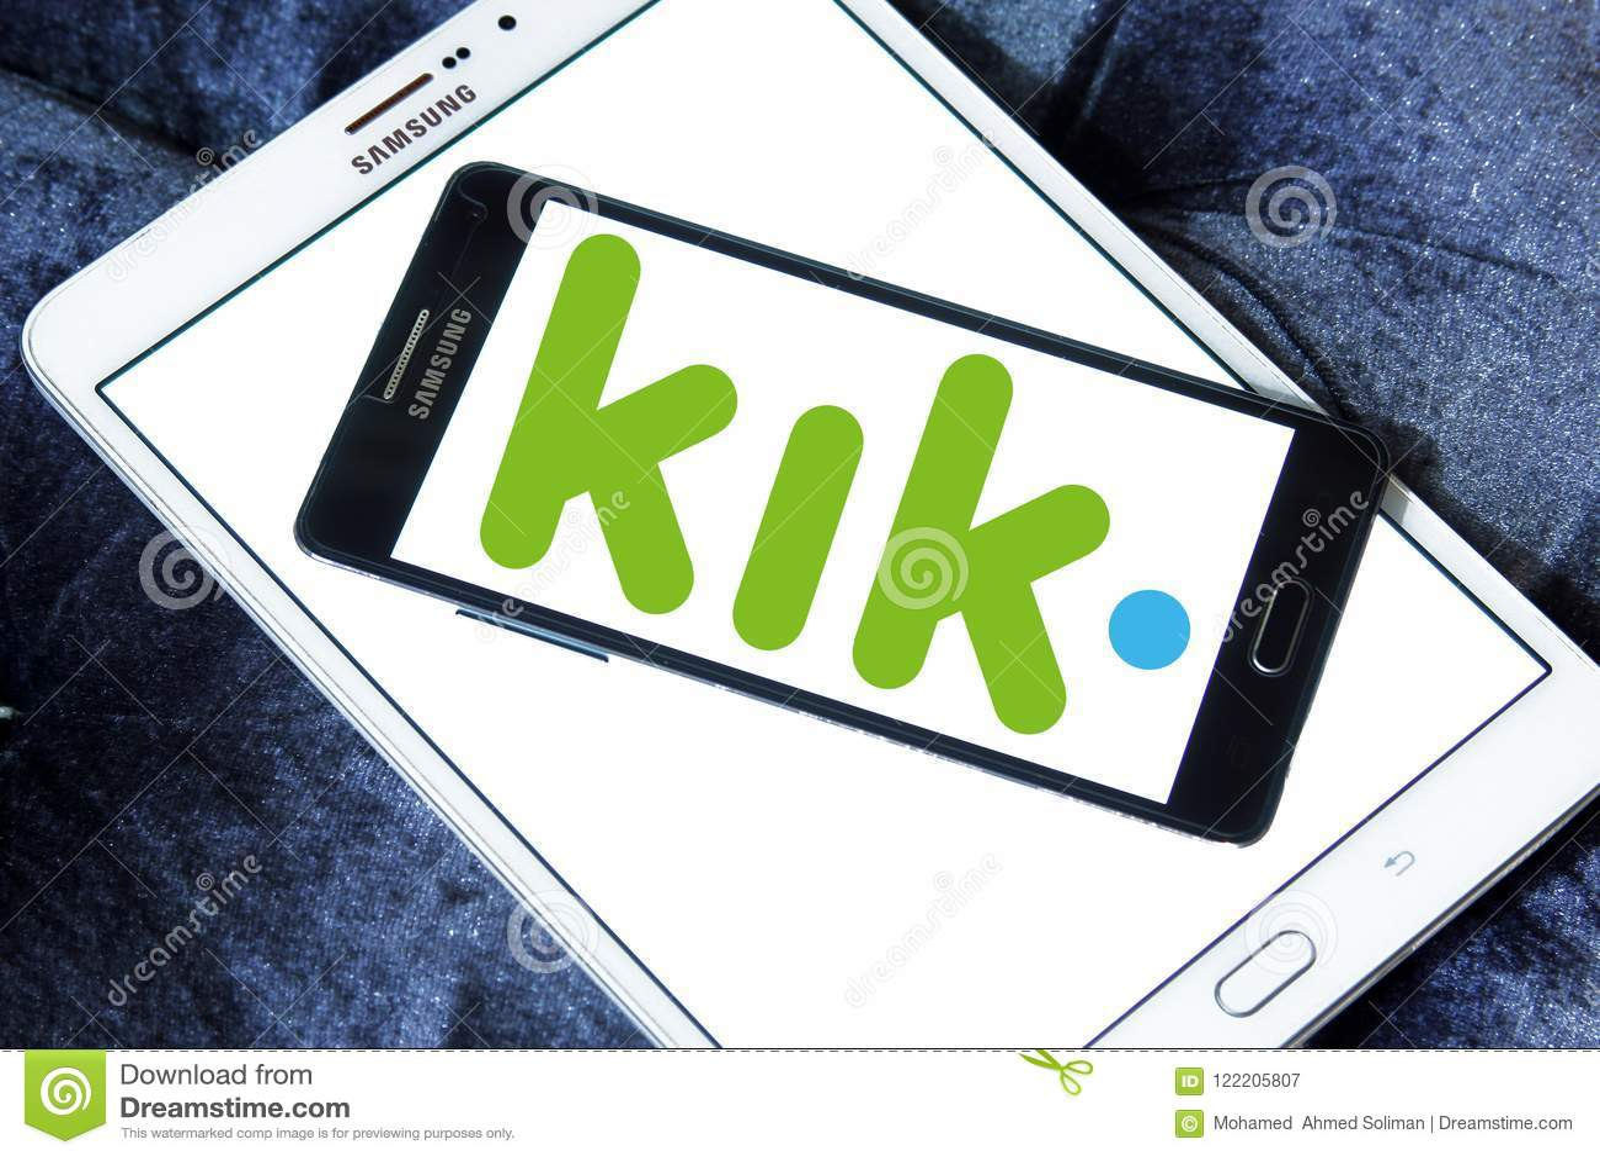 204 kik photos - free & royalty-free stock photos from